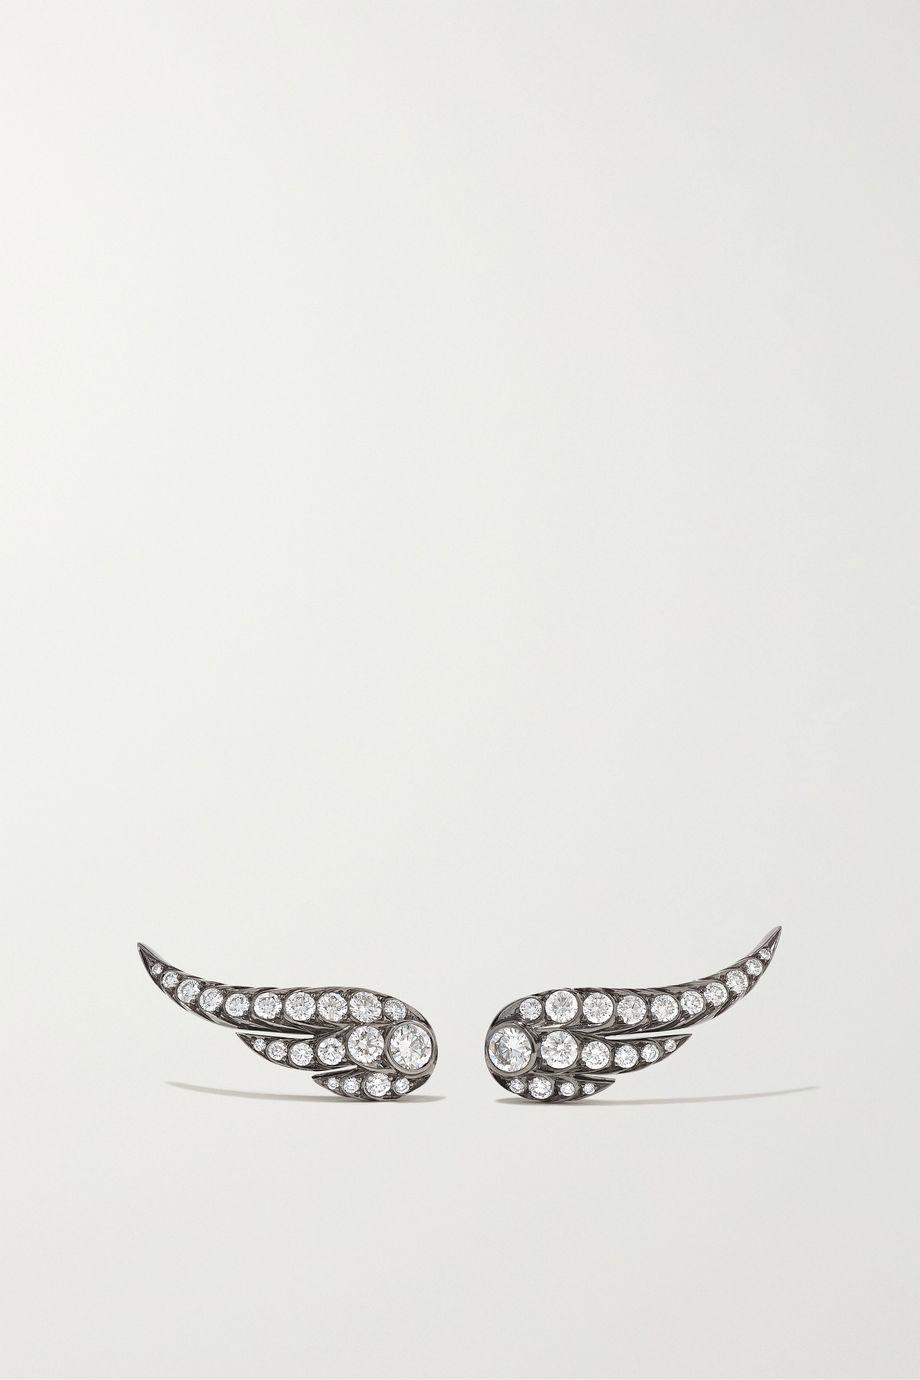 Jessica McCormack Wing of Desire 18-karat blackened white gold diamond earrings